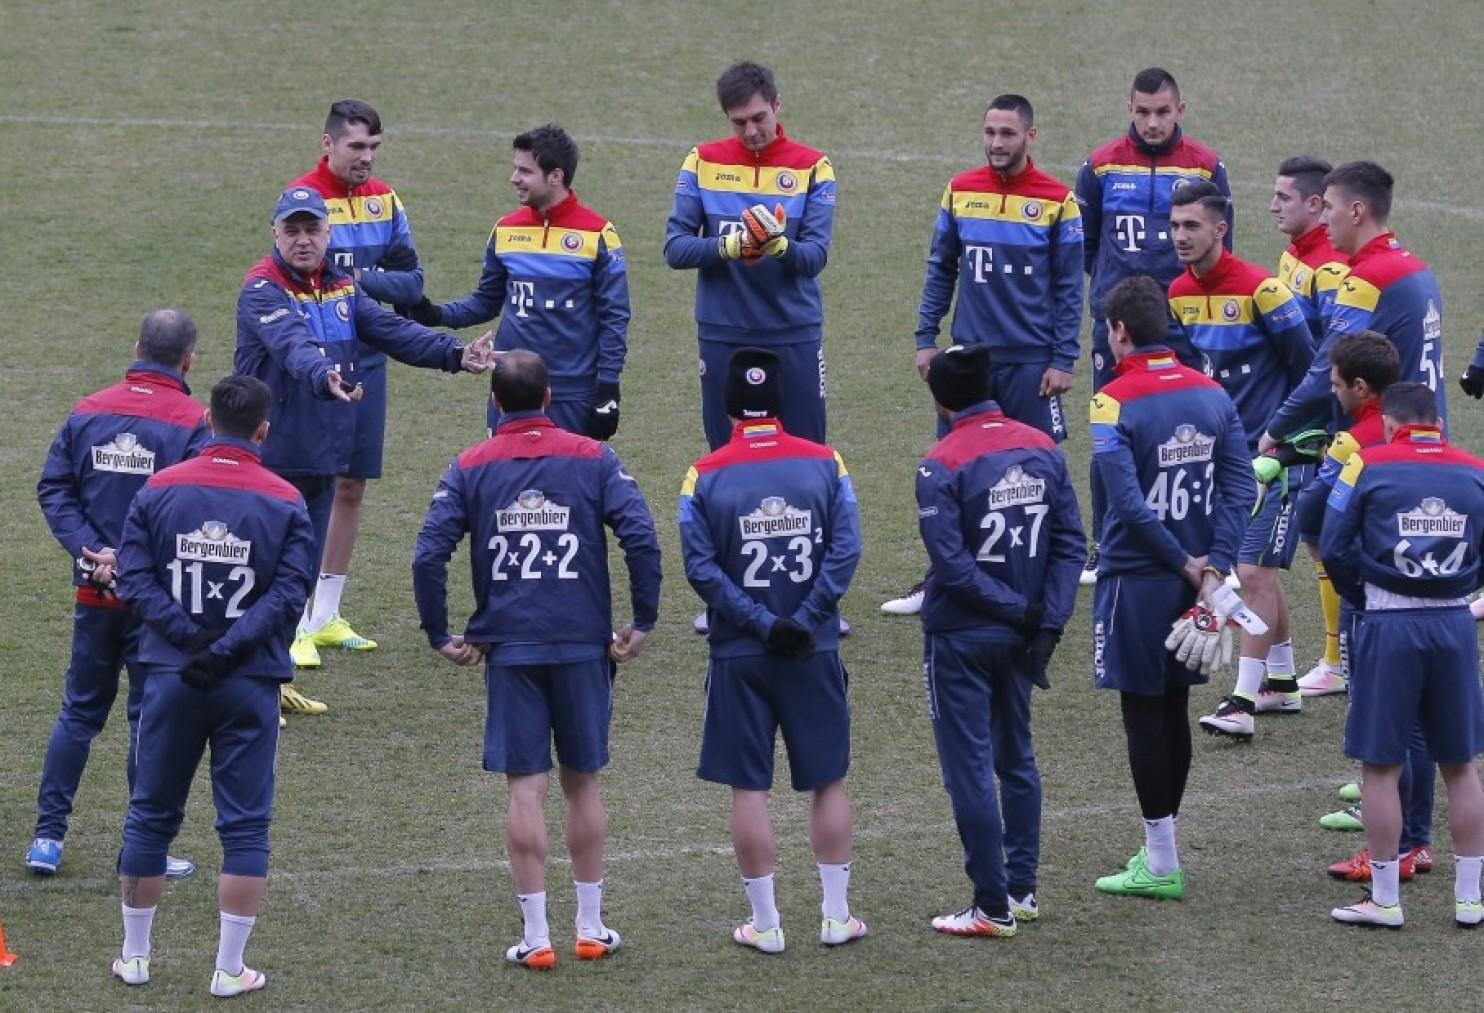 math romanian soccer team romanian itineraries